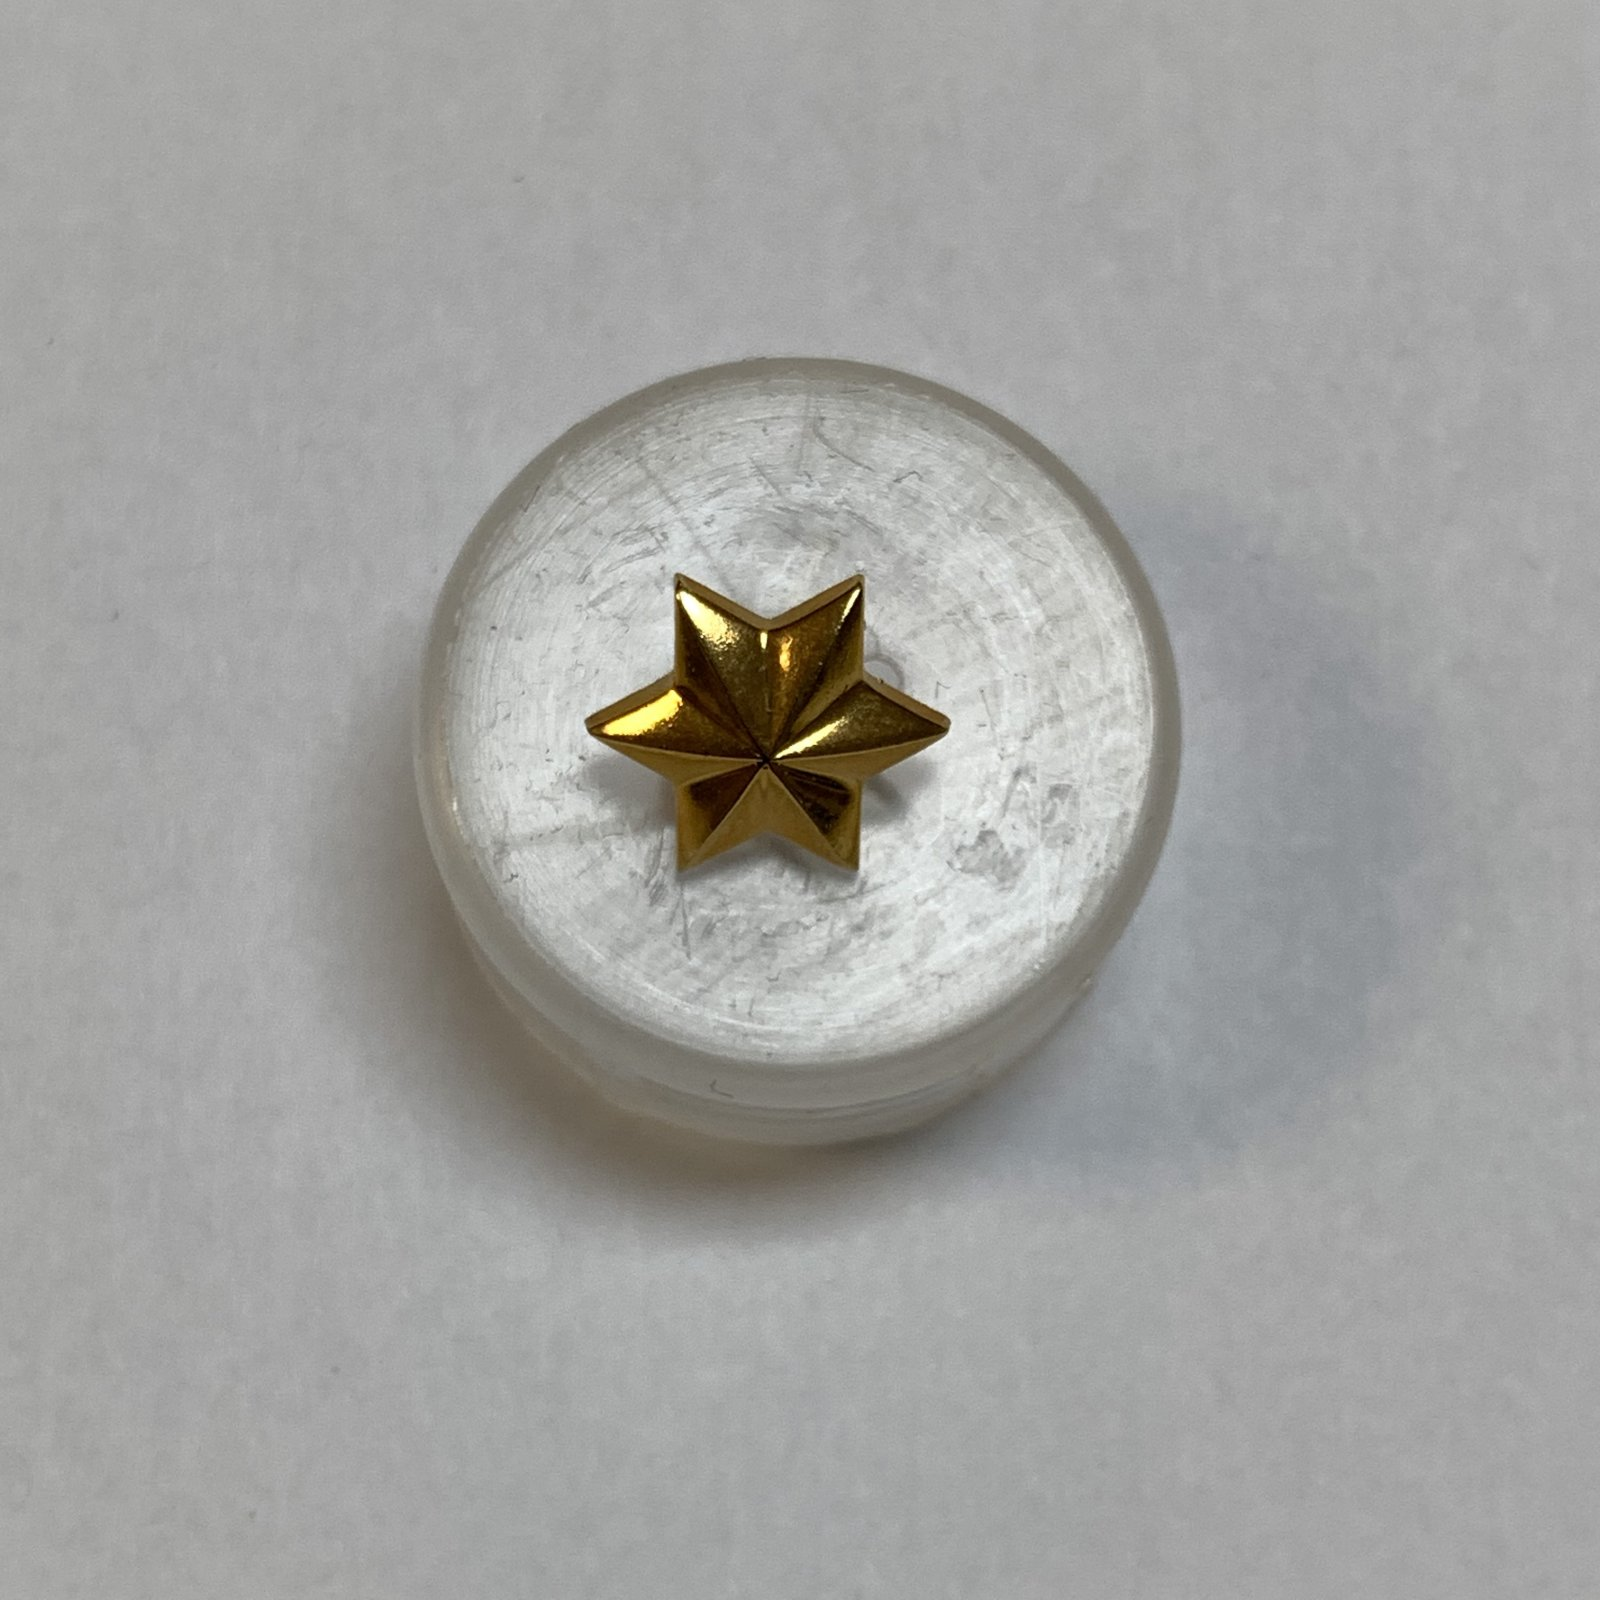 Gold Star Button 1/2 Inch